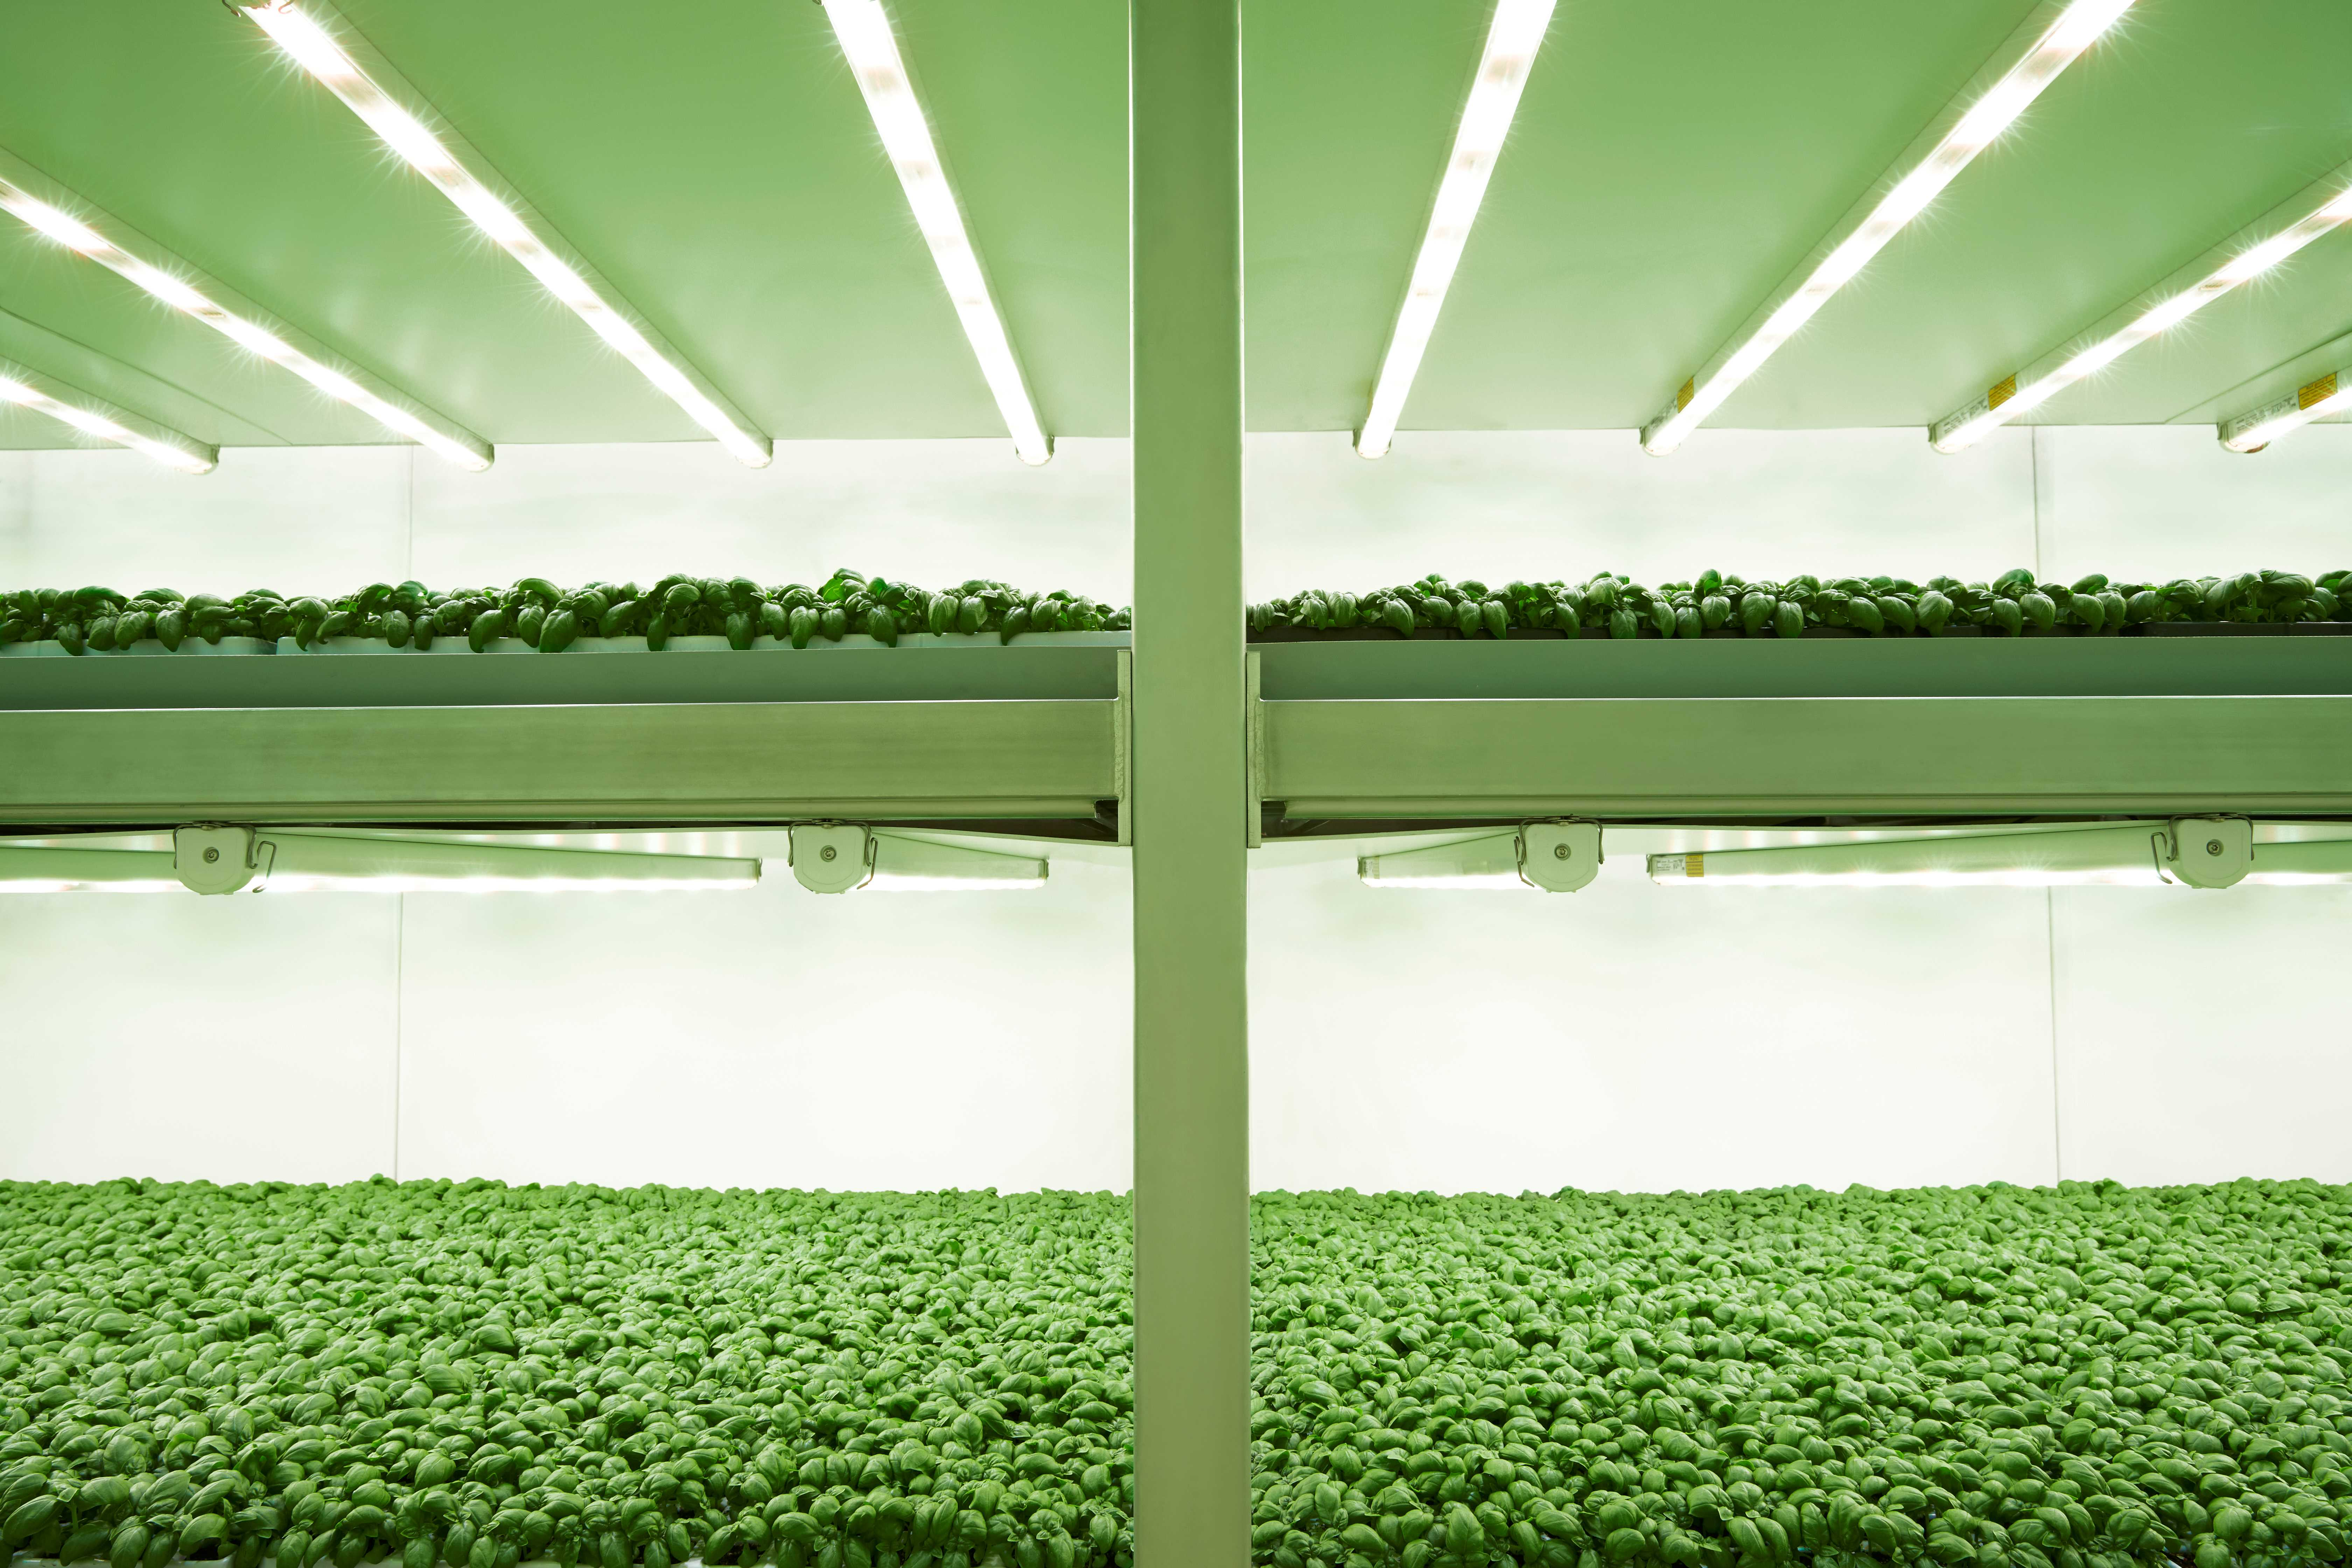 Planet Farms vertical farming system